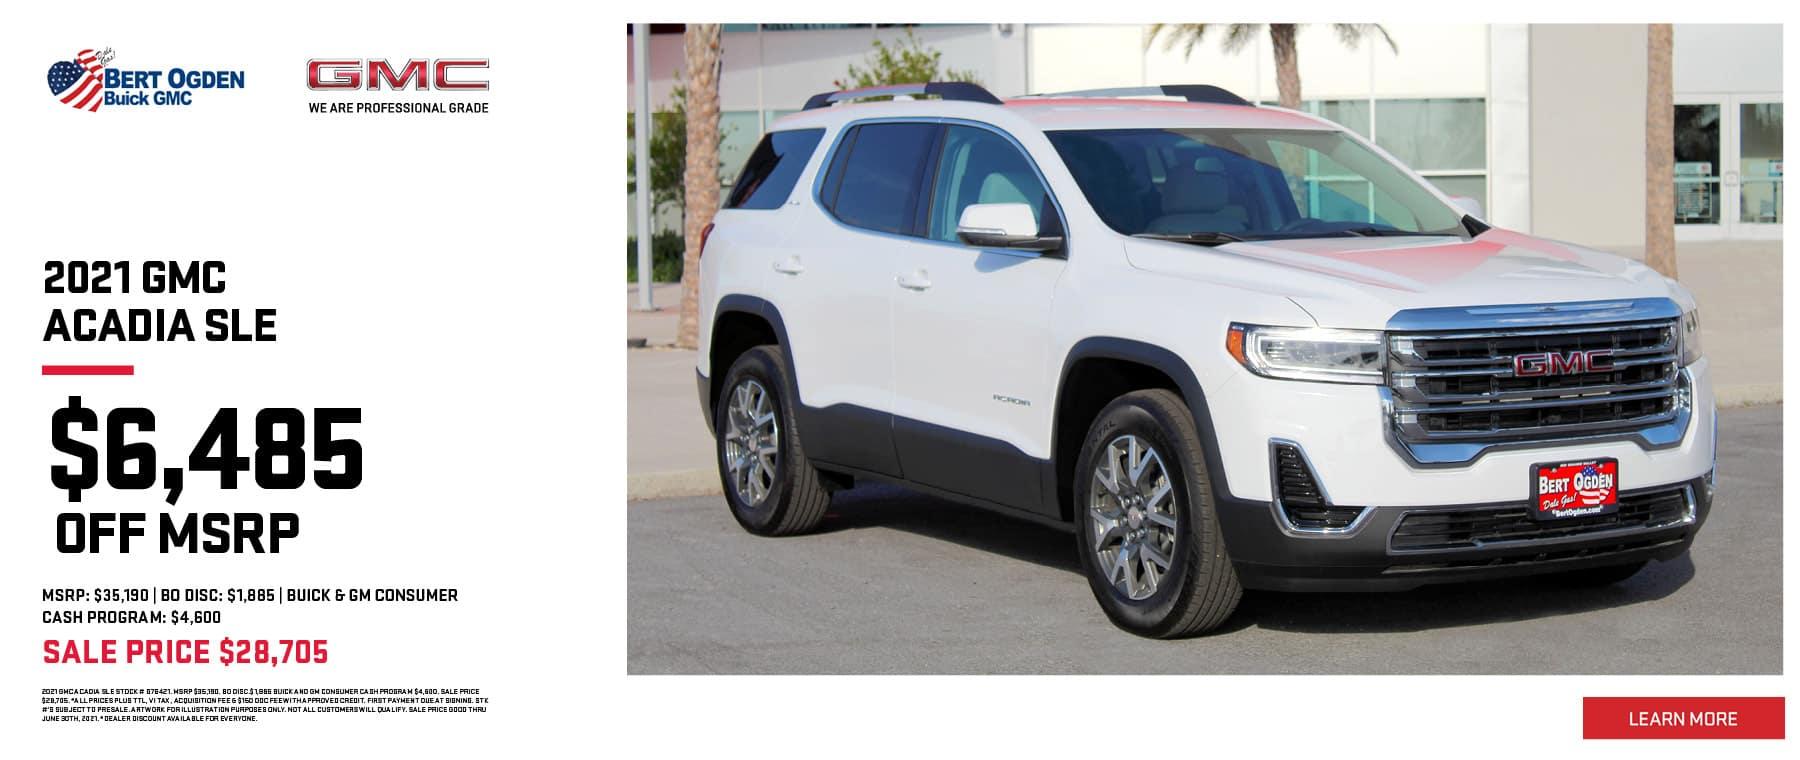 Save On The 2021 GMC Acadia SLE | Bert Ogden Buick GMC | Edinburg, TX